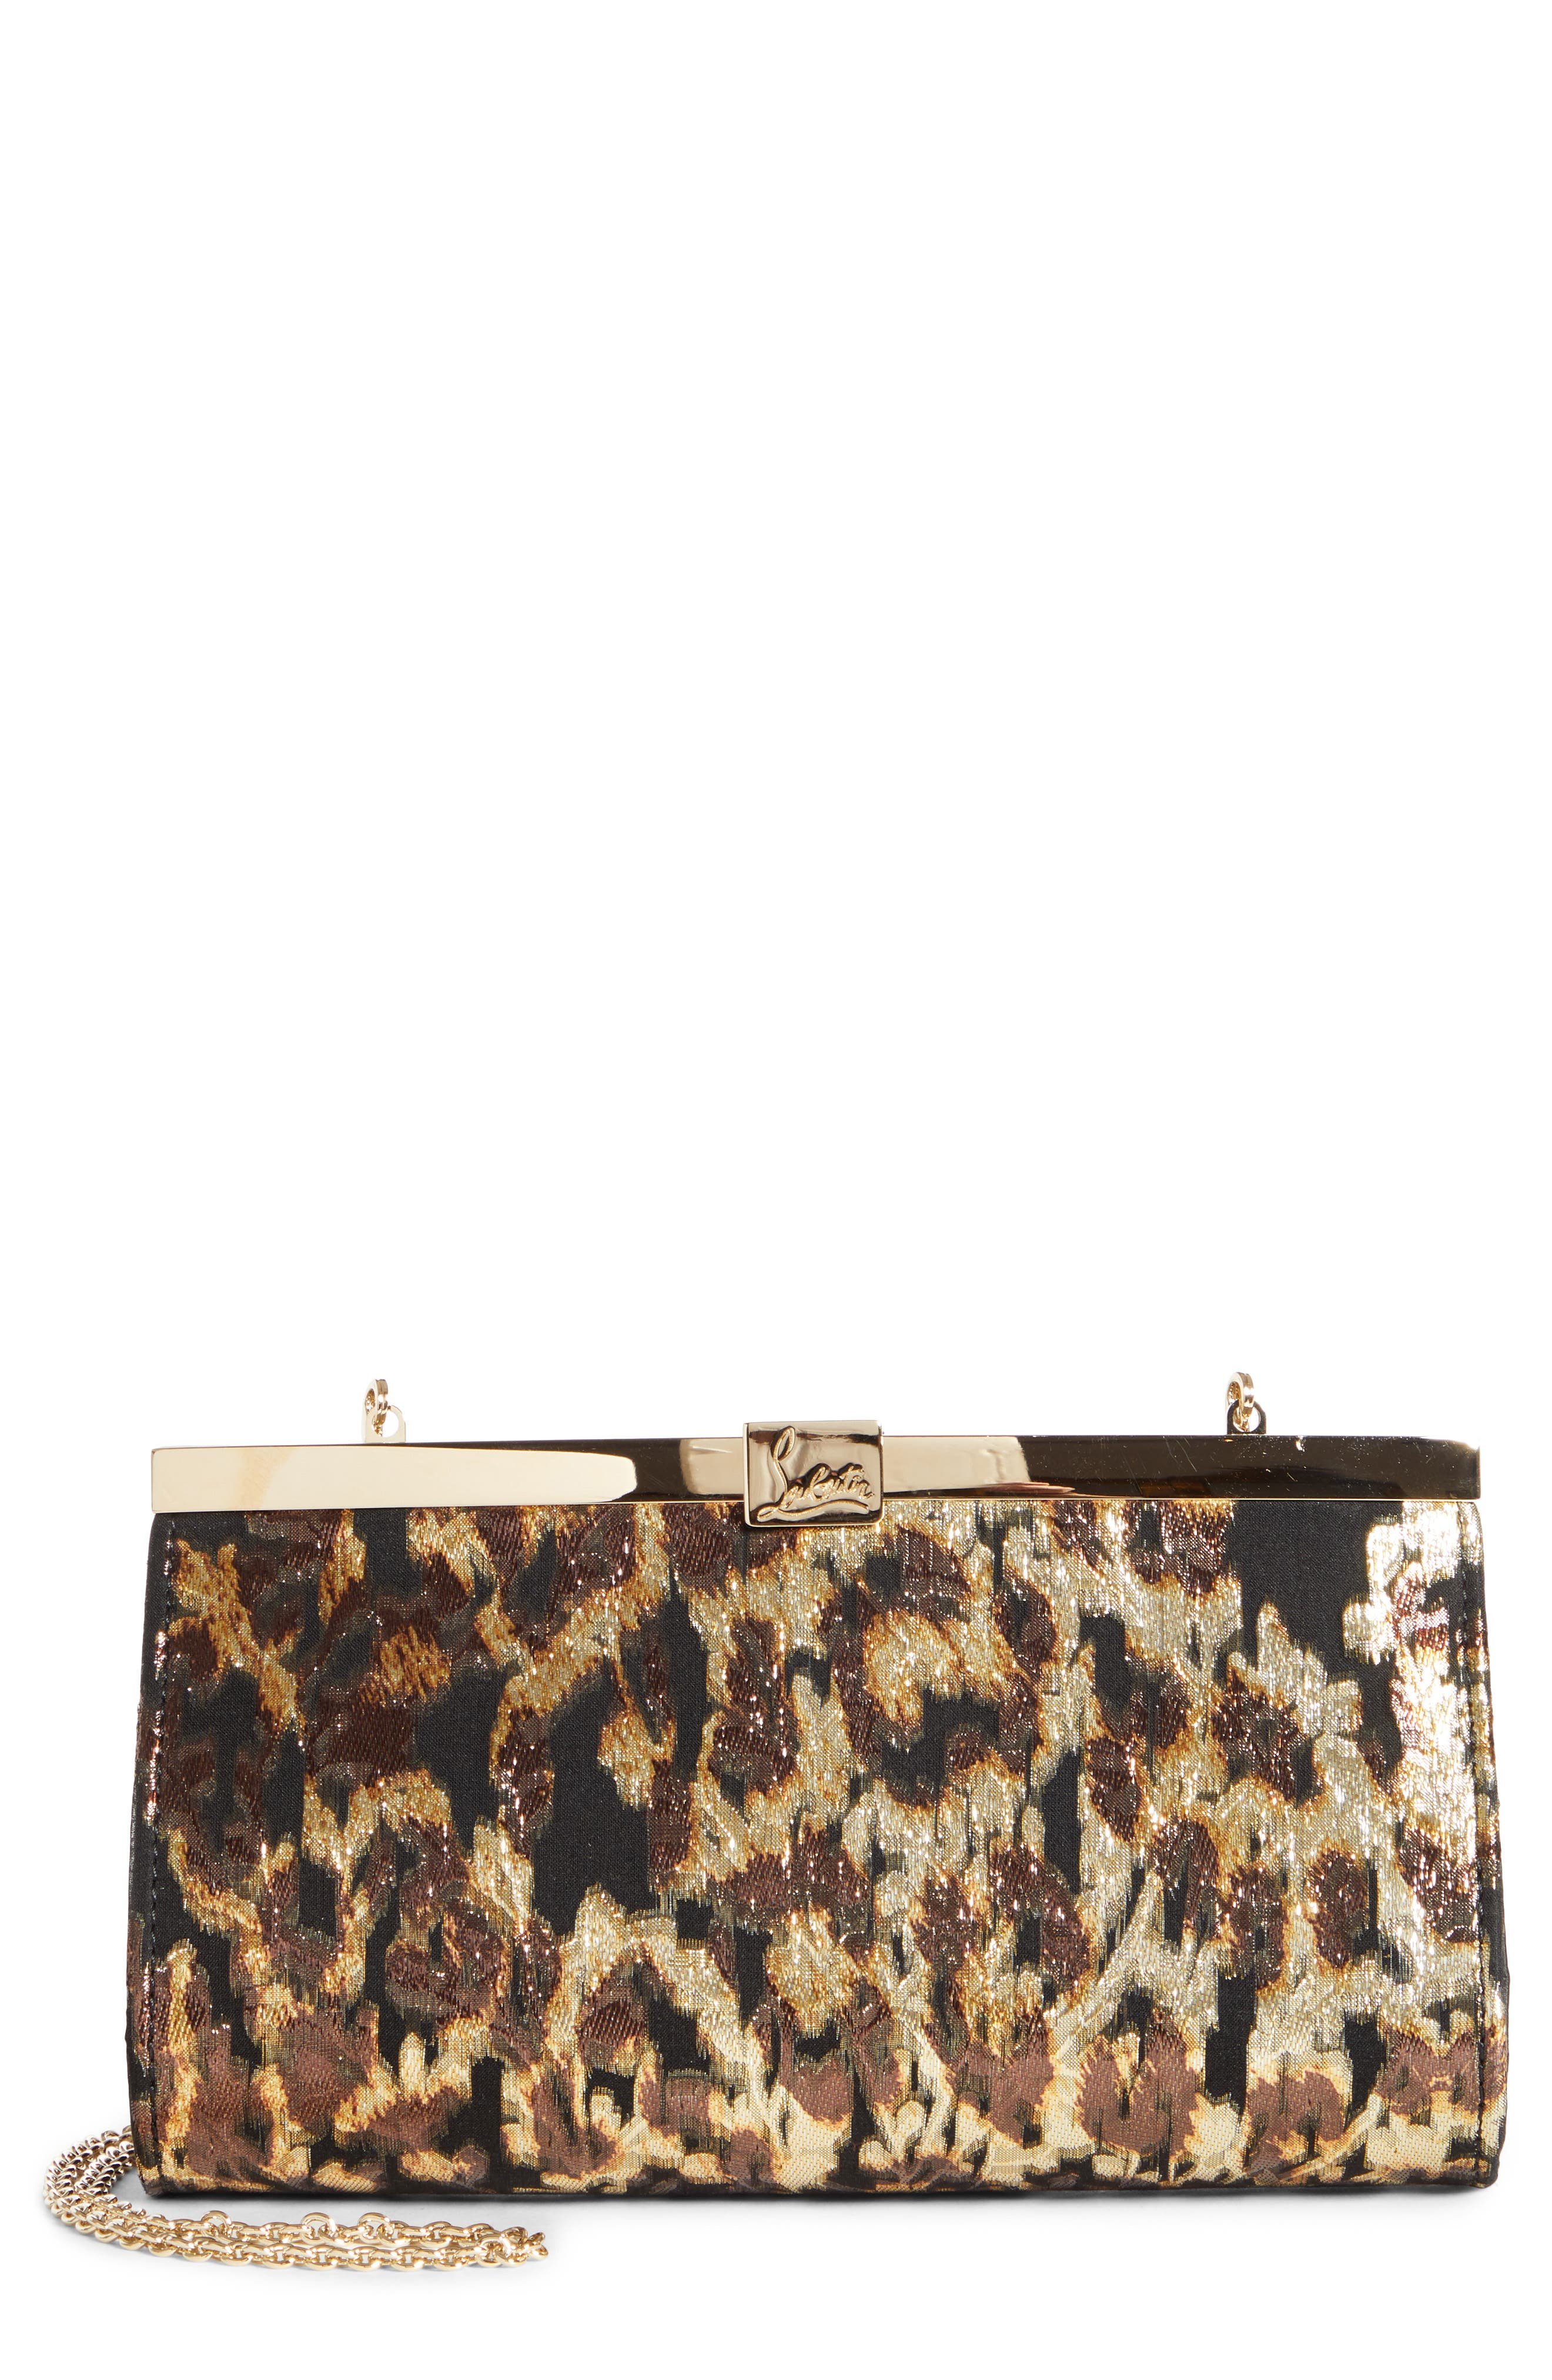 Christian Louboutin Clutch Small Palmette Metallic Leopard Print Clutch